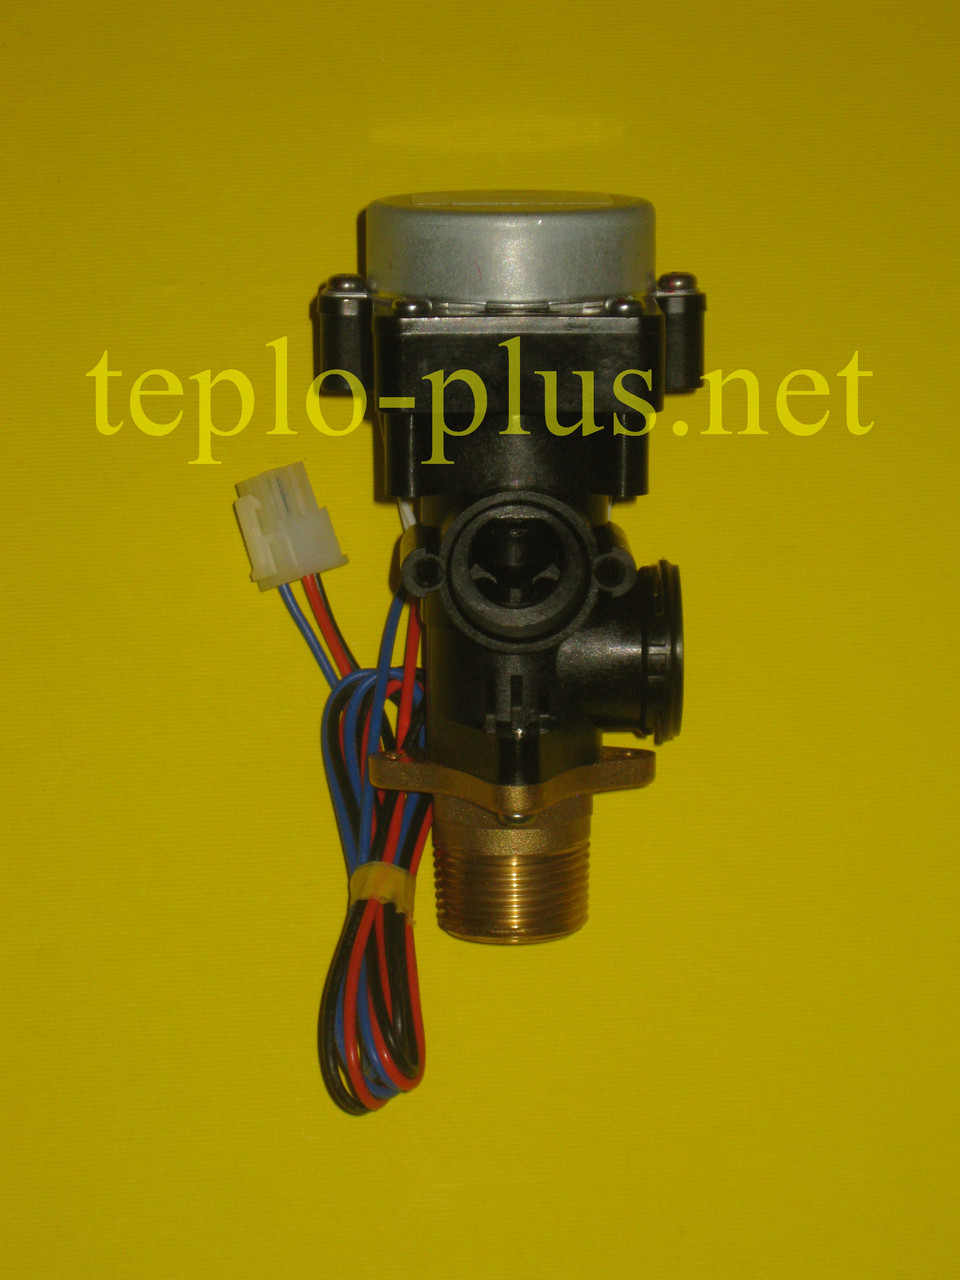 Трехходовой клапан (кран) 30004815B (AAVC9EX00008A) Navien Ace ATMO 13-24kw, TURBO 13-40kw, TURBO Coaxial